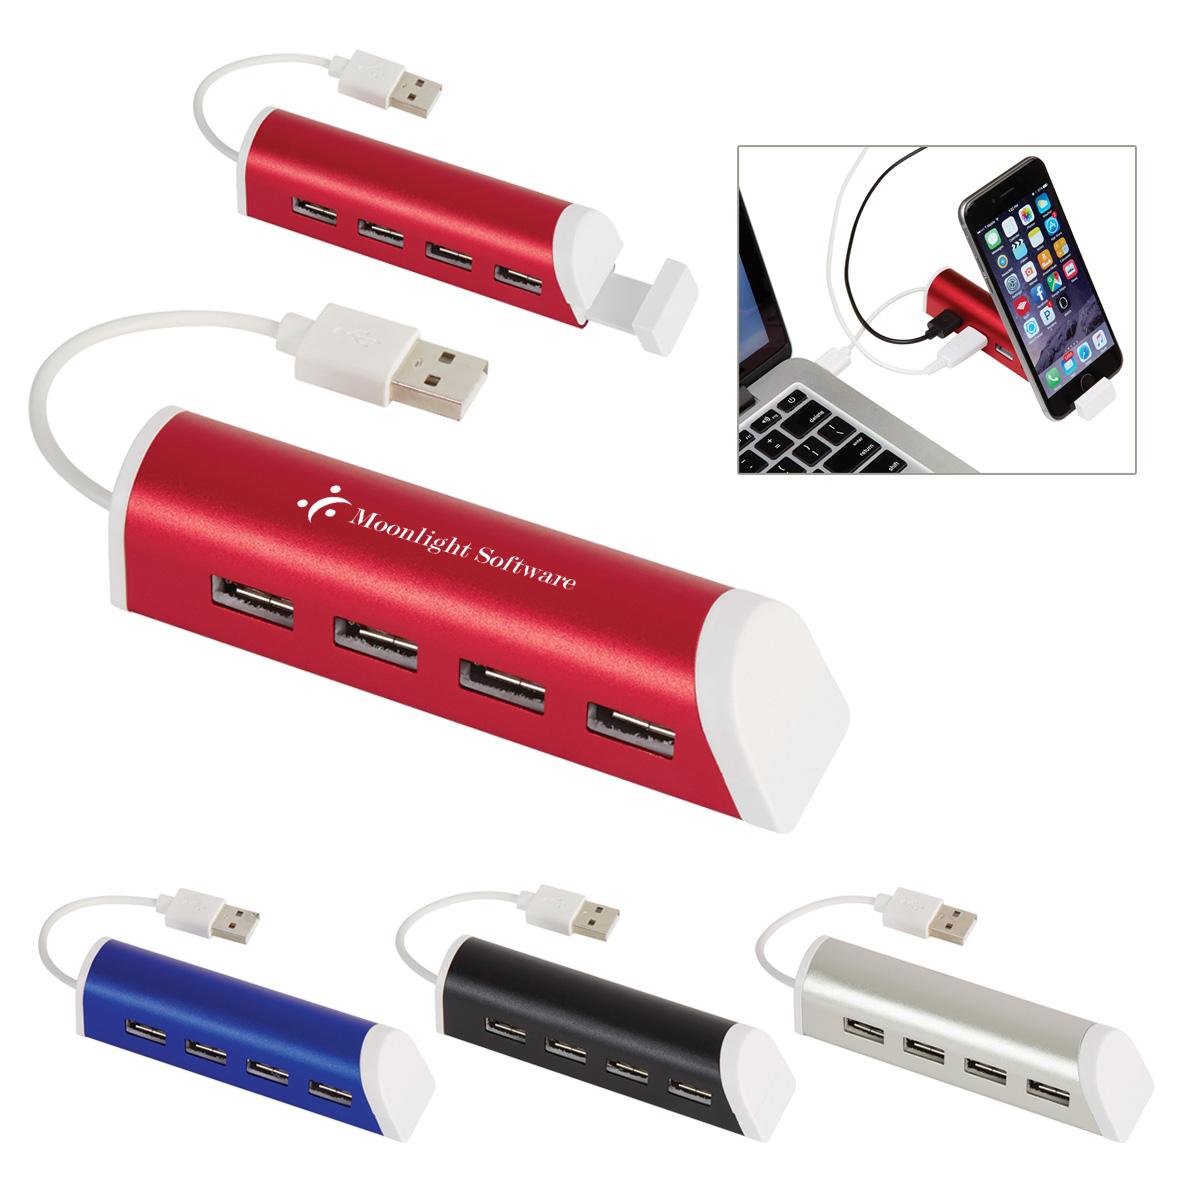 #CM 2836 - 4-Port Aluminum USB Hub With Phone Stand